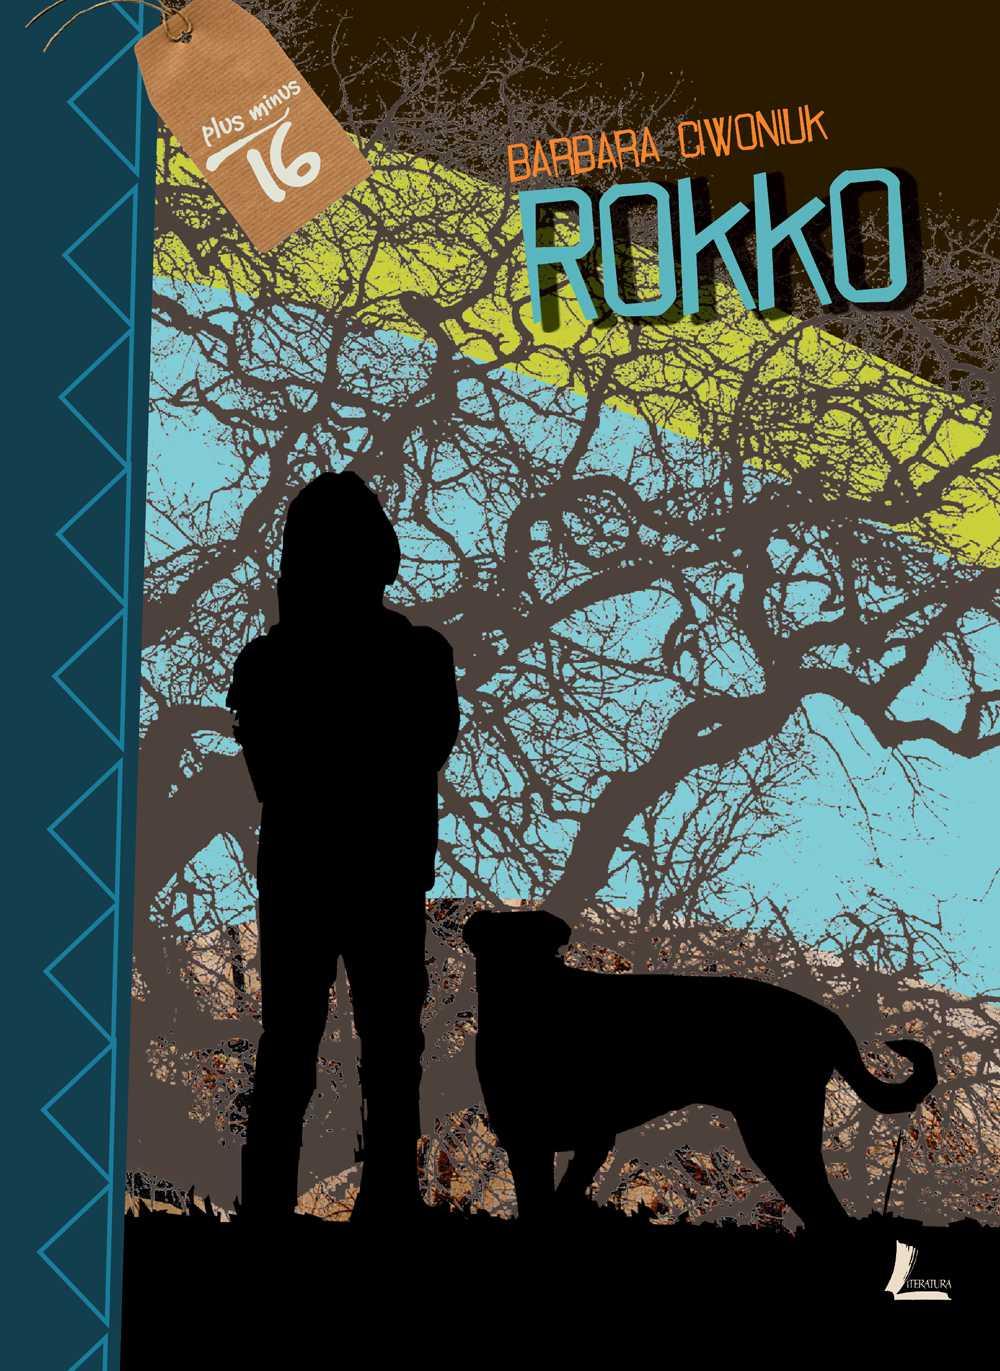 Rokko - Ebook (Książka na Kindle) do pobrania w formacie MOBI